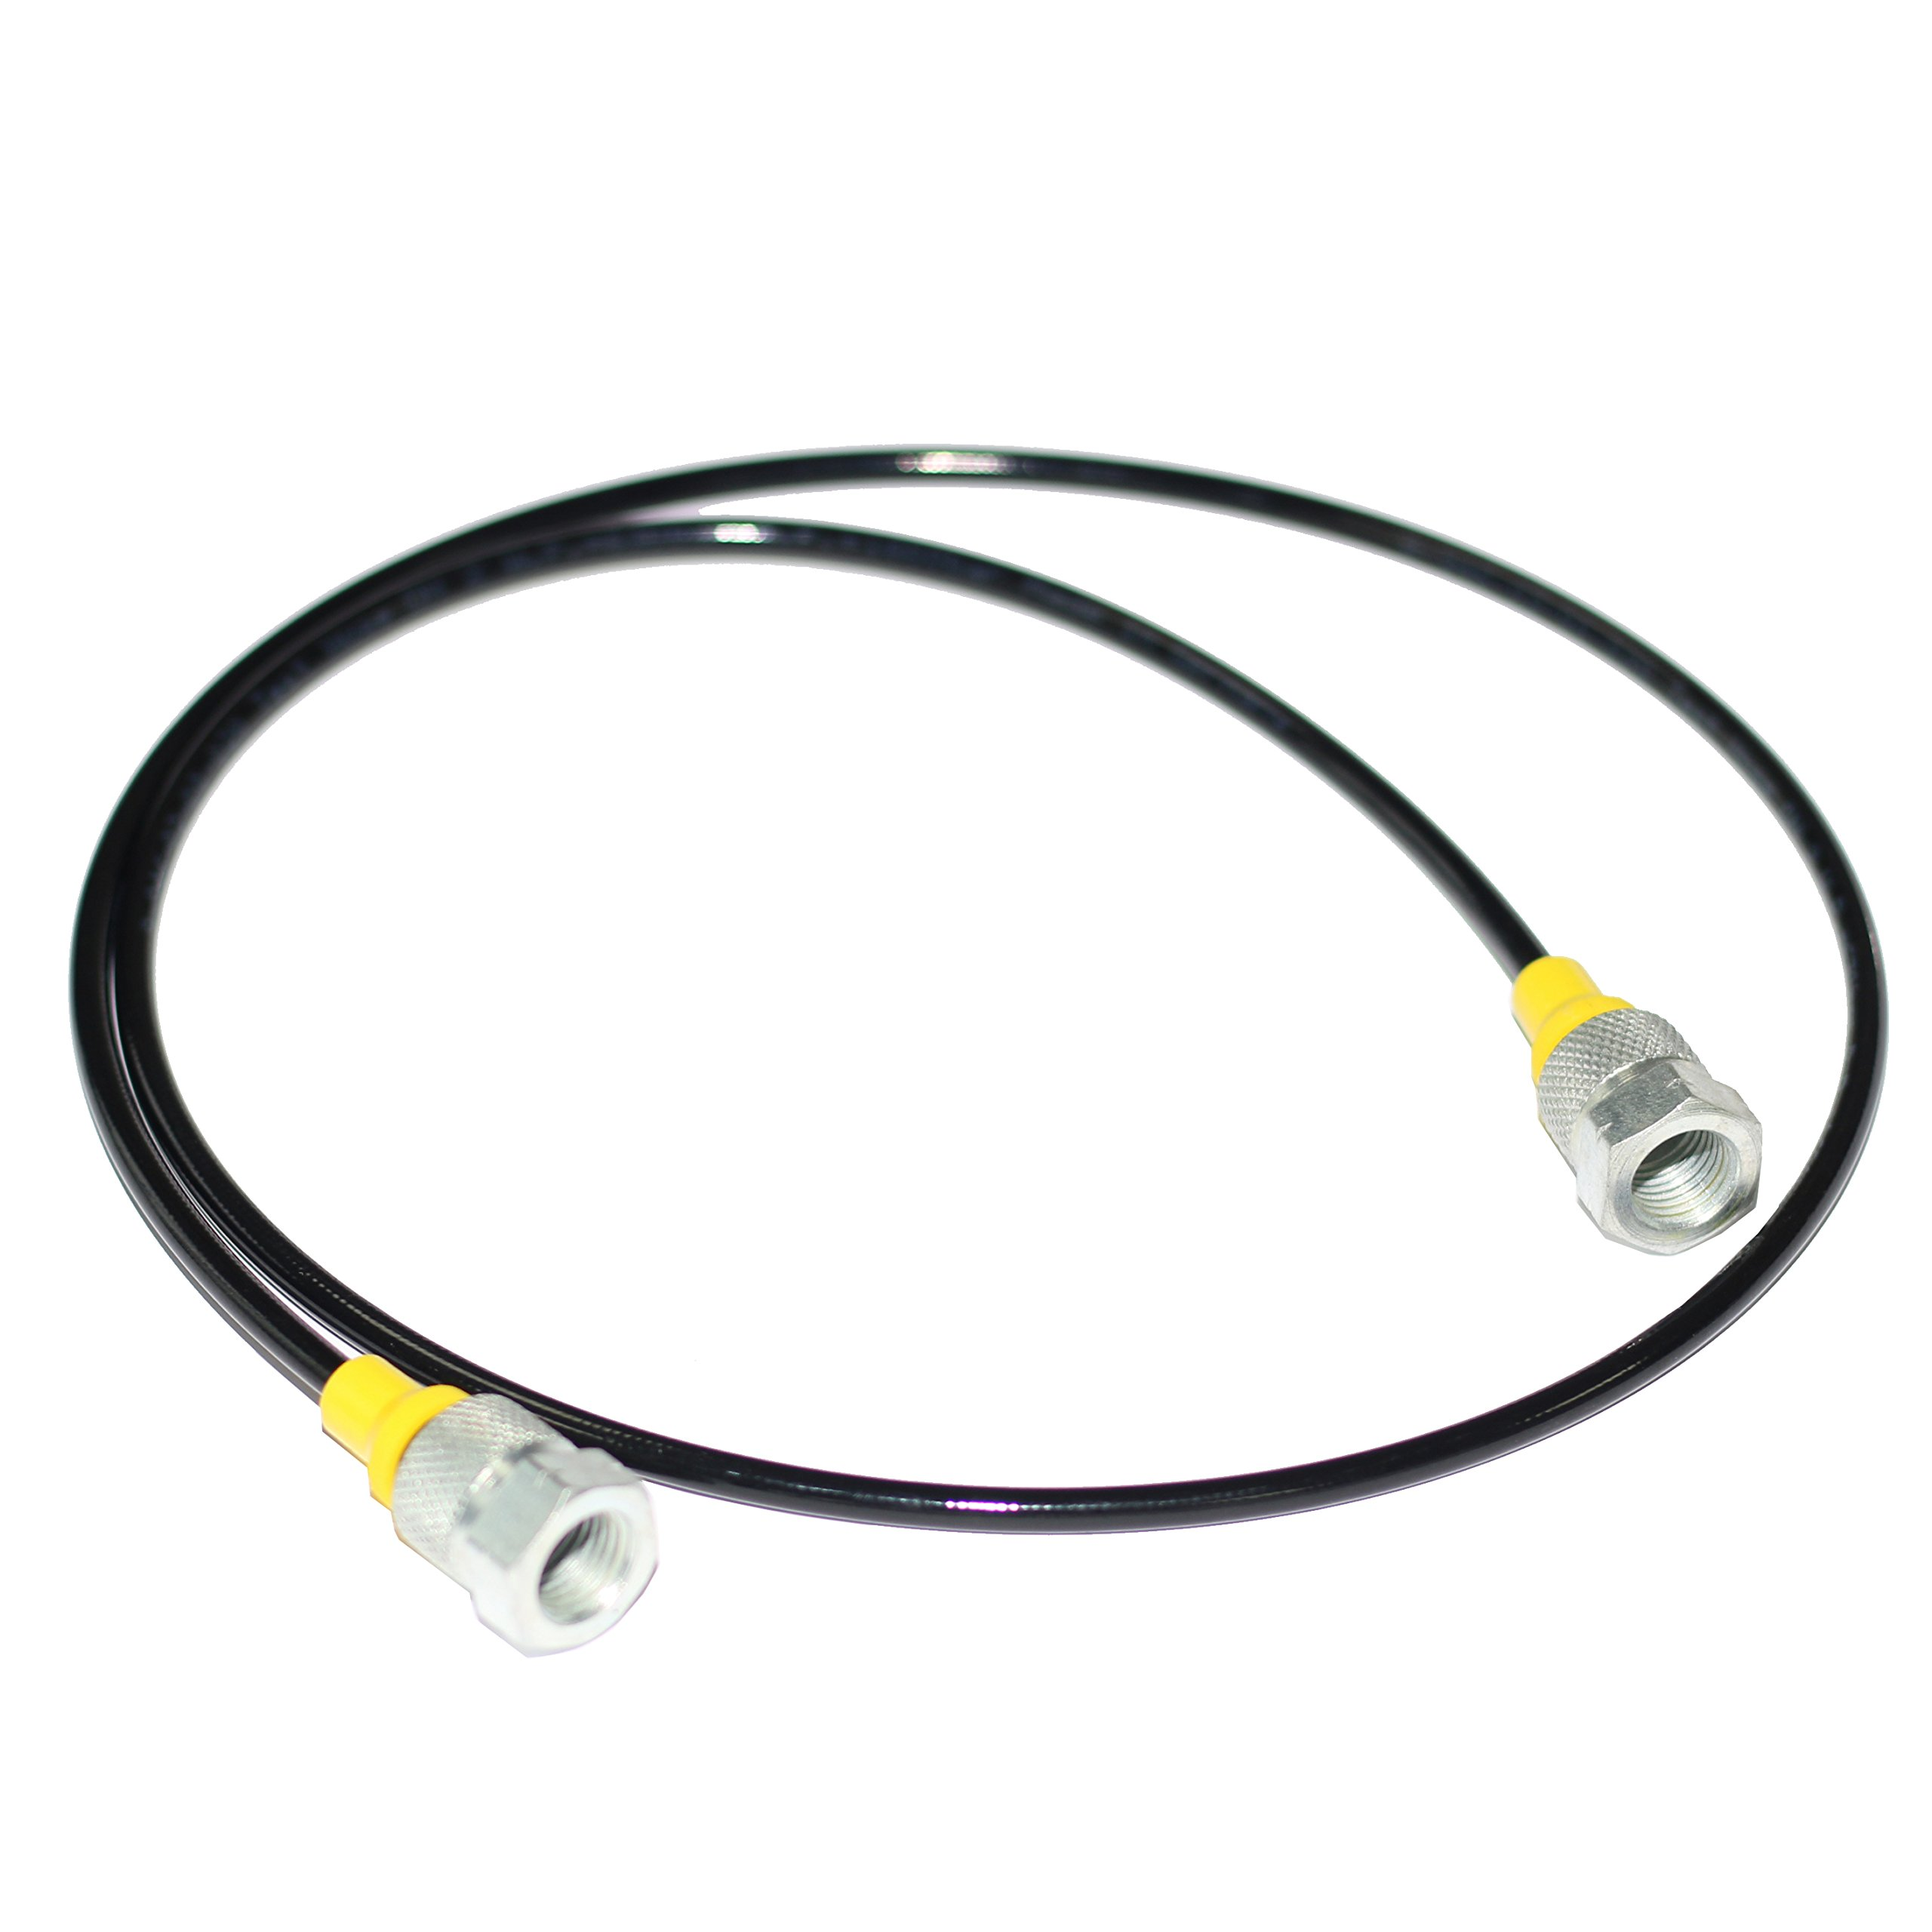 XZT NPT-NPT 9000PSI/630BAR Hydraulic Pressure Test Hose,Test couling Hose (3FT/1m) by XZT